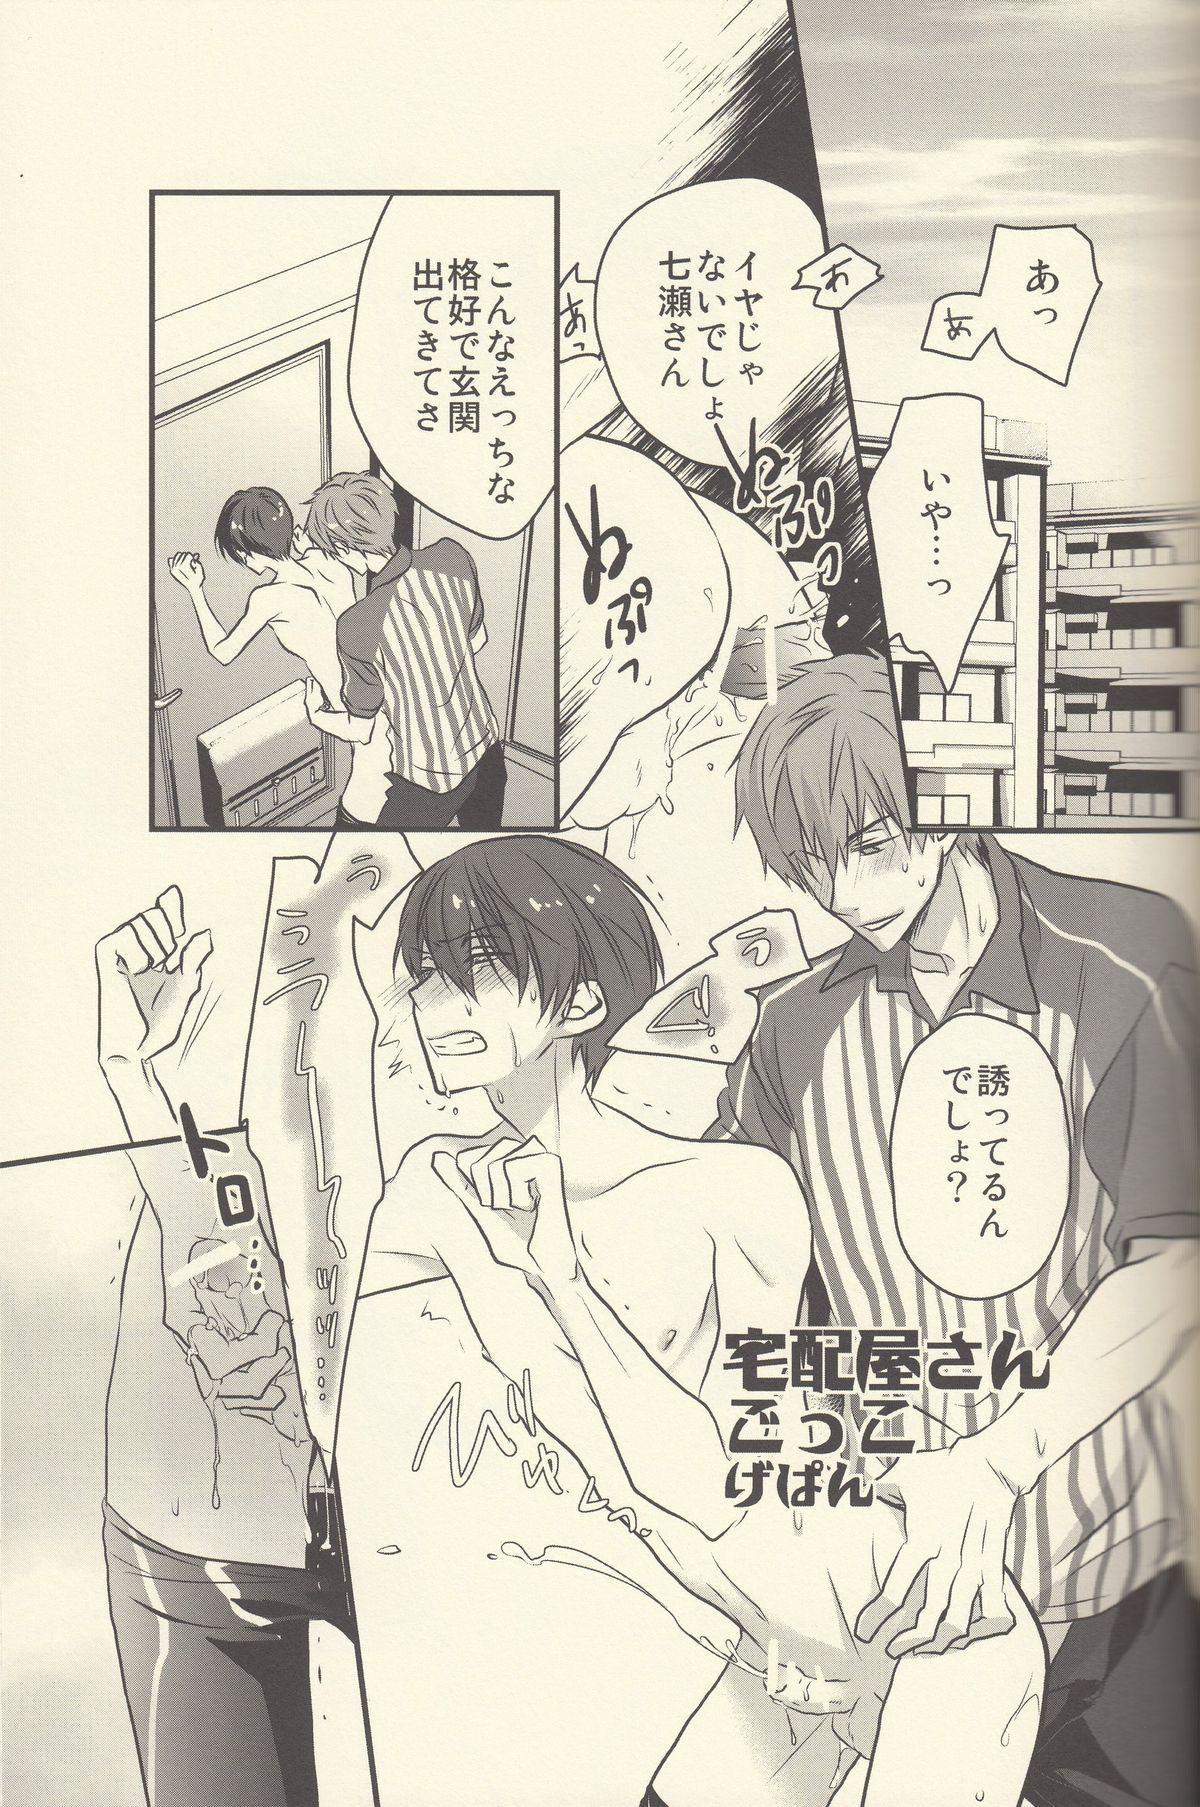 Shiofuki no Friendship - Makoto ♥ Haruka Squirting Anthology 26